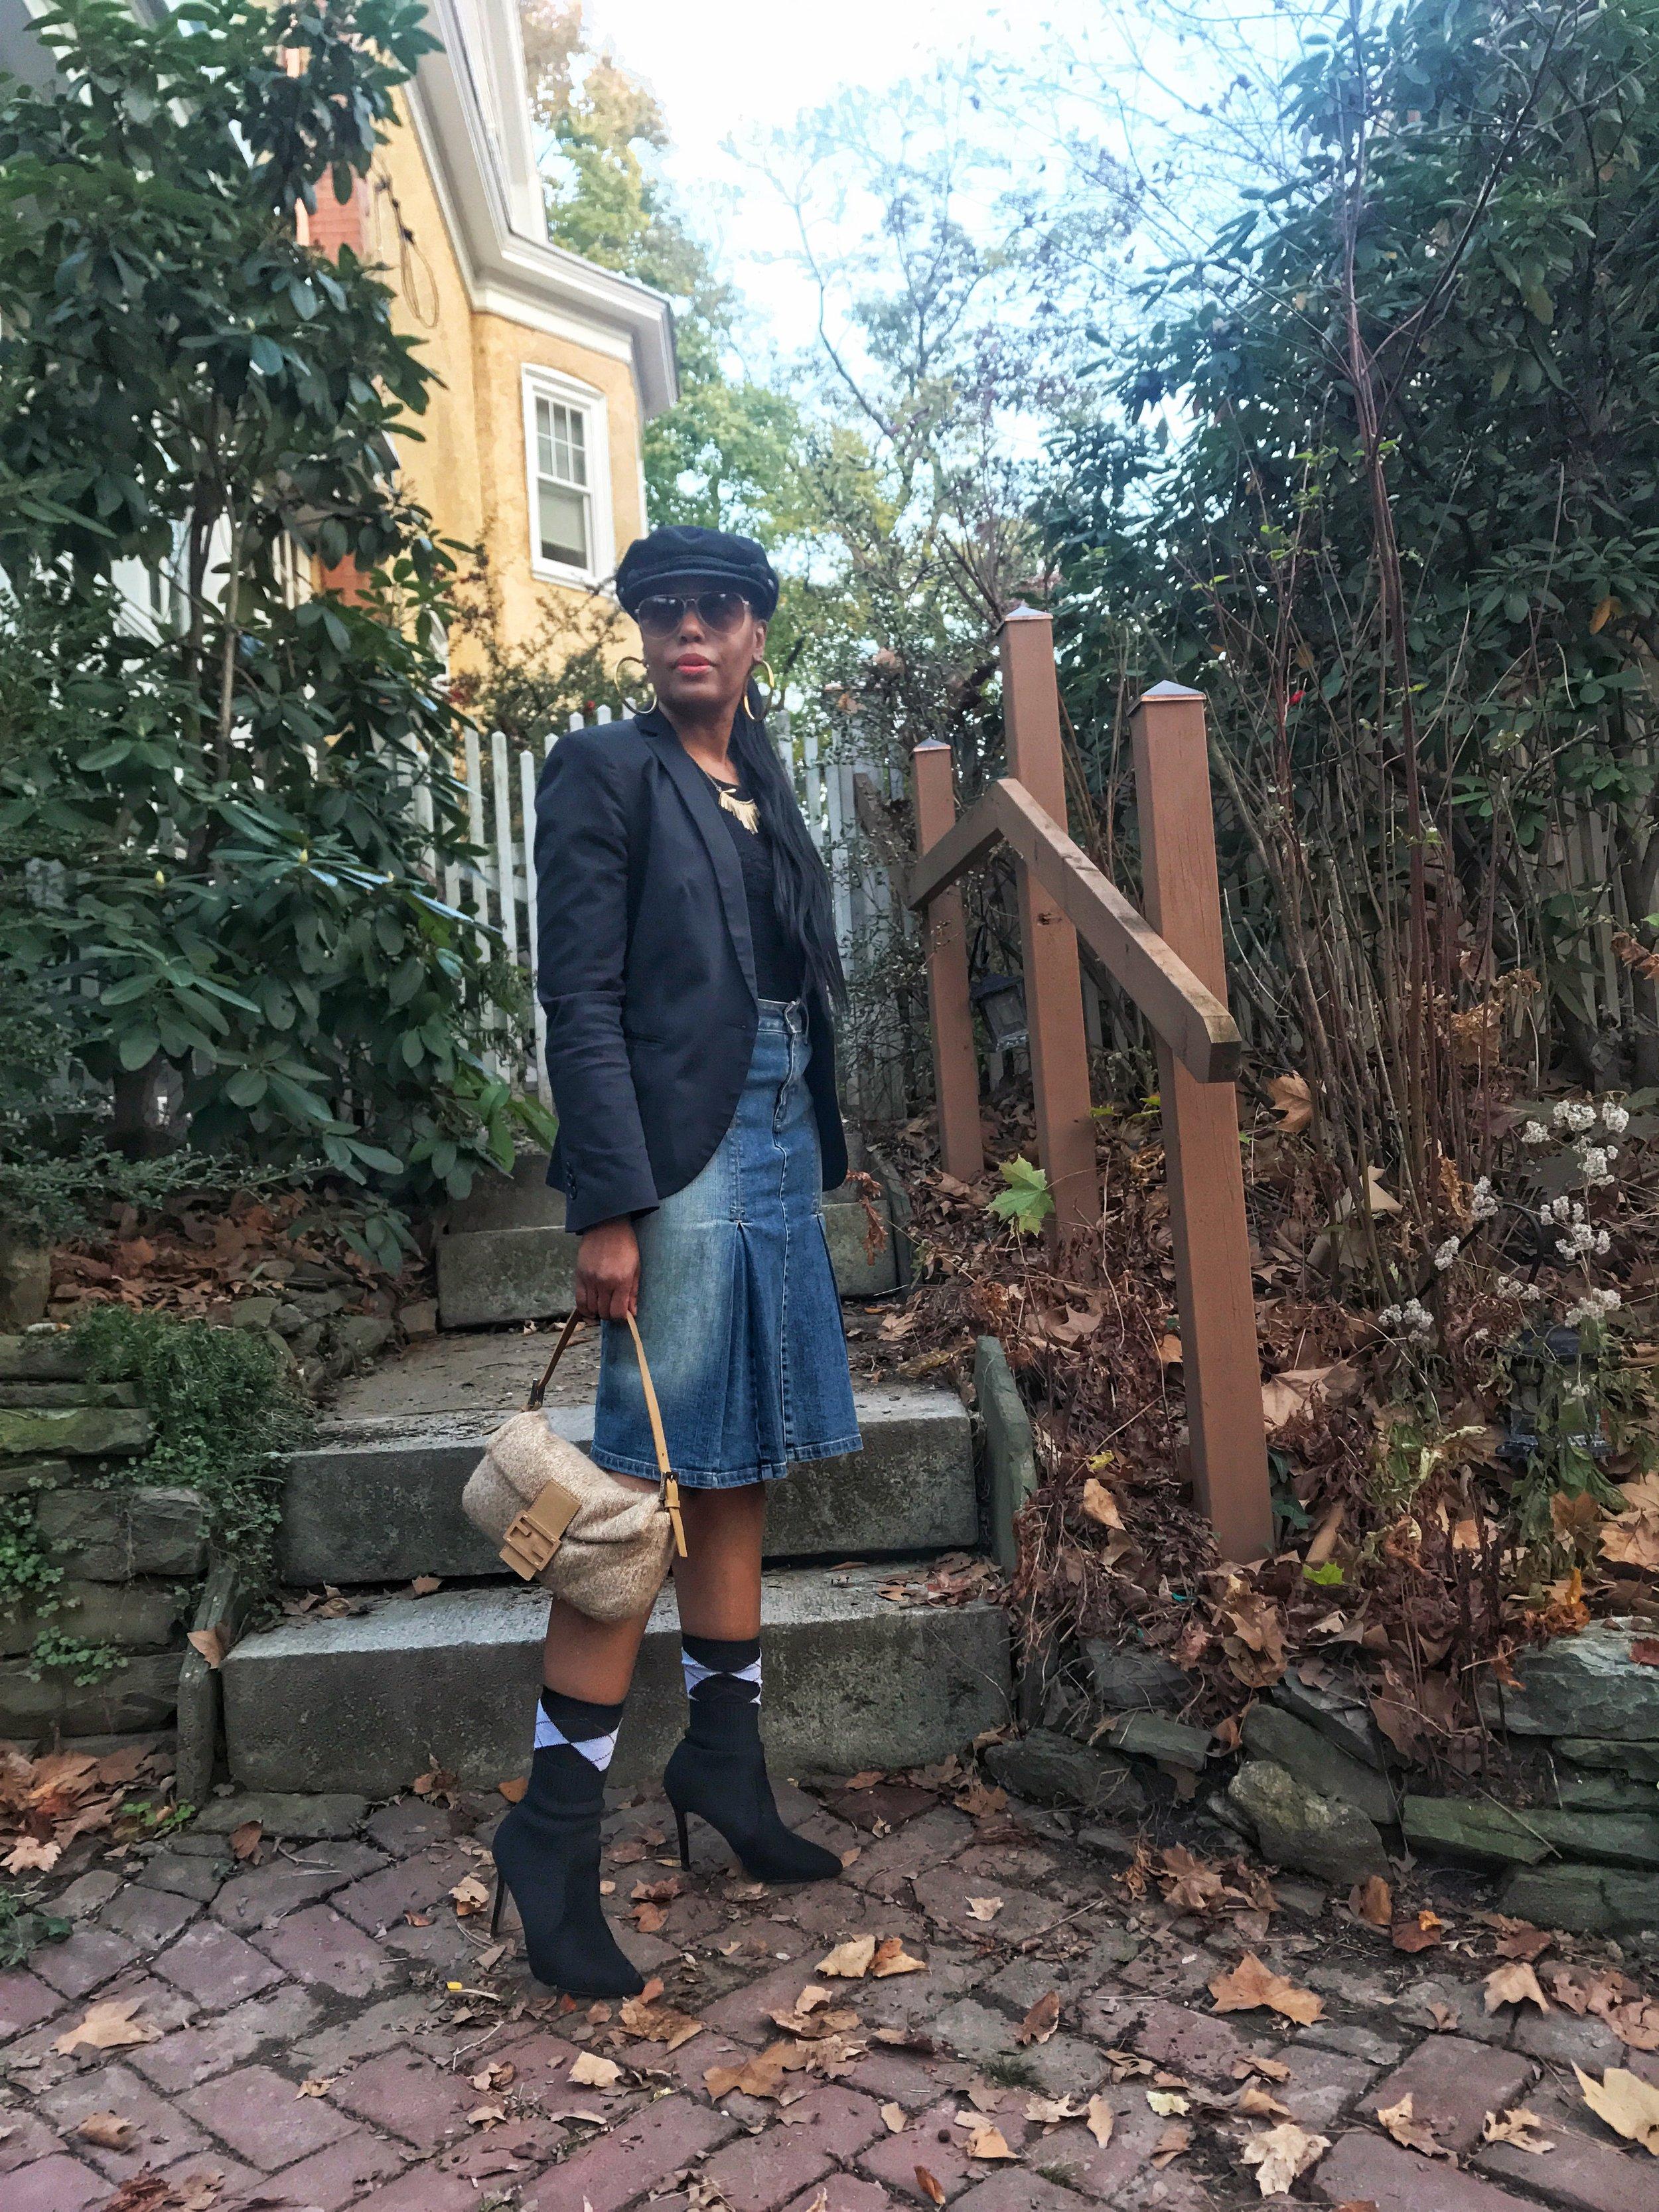 Denim Skirt (Levi's)(old) Alternatives  here    Top (DKNY)(old)   Blazer(Forever21) Alternative  here    Newsboy Cap (Primark) Alternative  here    Booties (TJ Maxx) Alternative  here   Bag (Fendi)